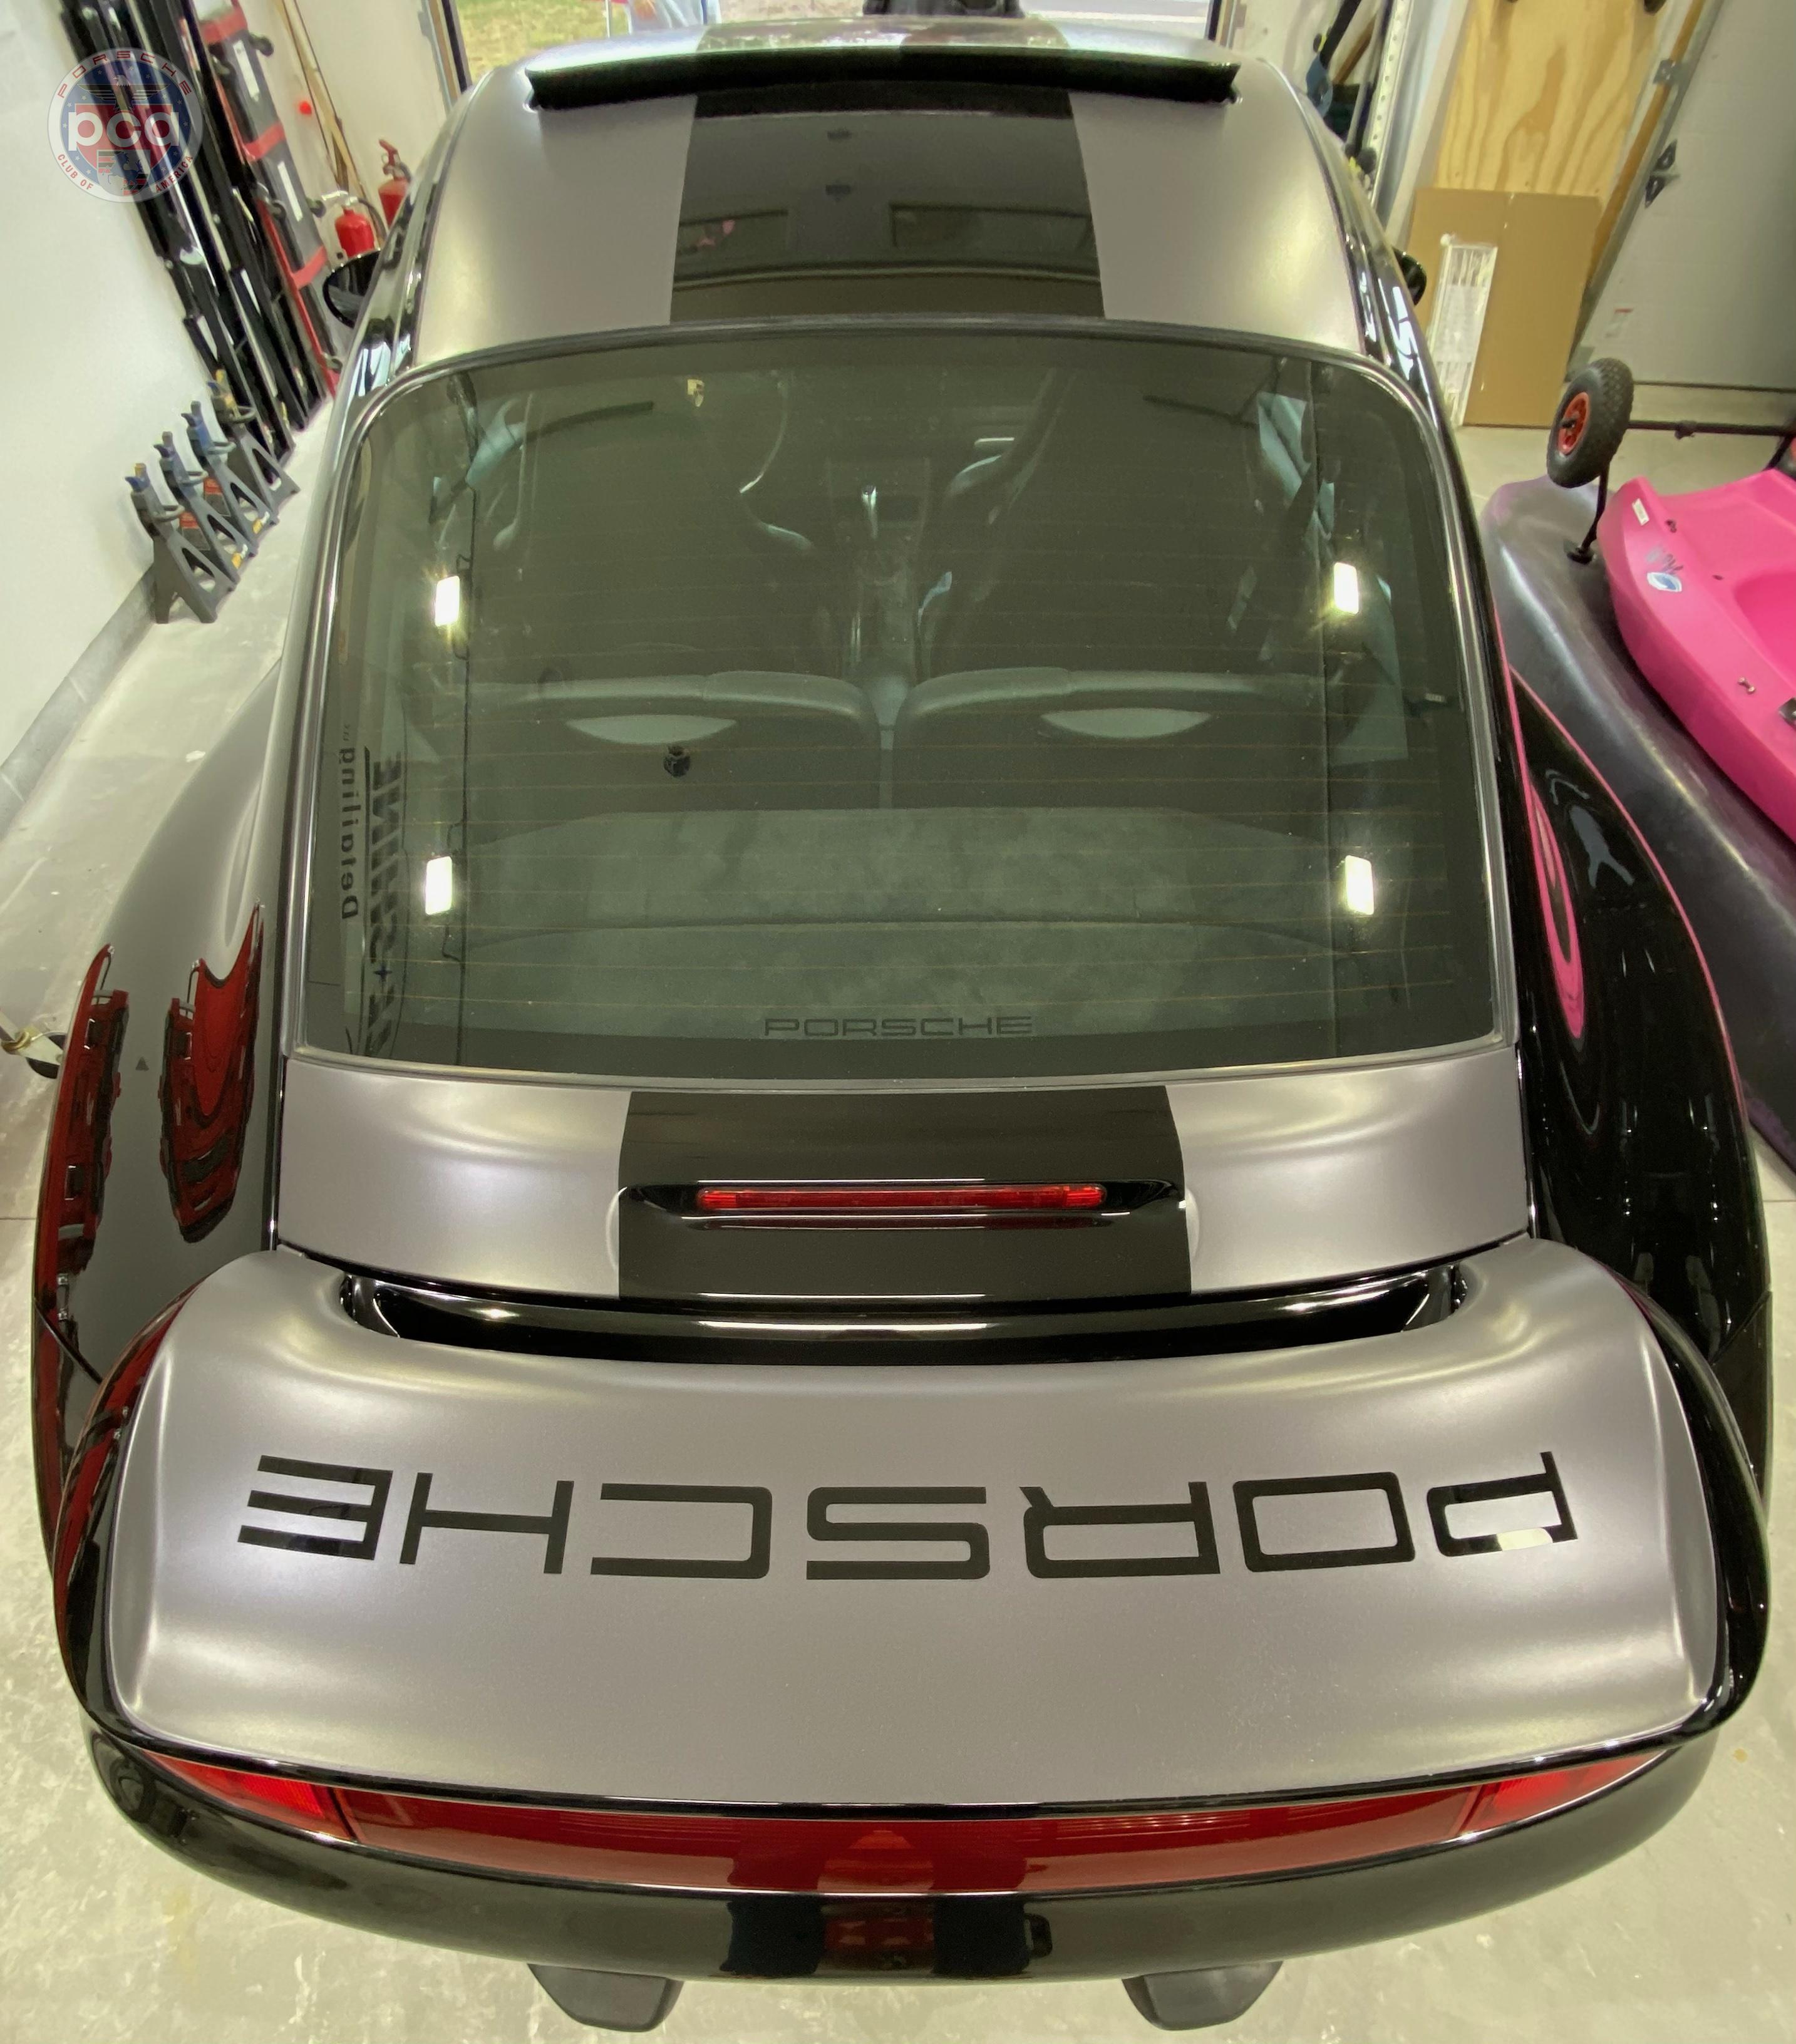 PCA Garage - 2004 911 Carrera 4S Porsche